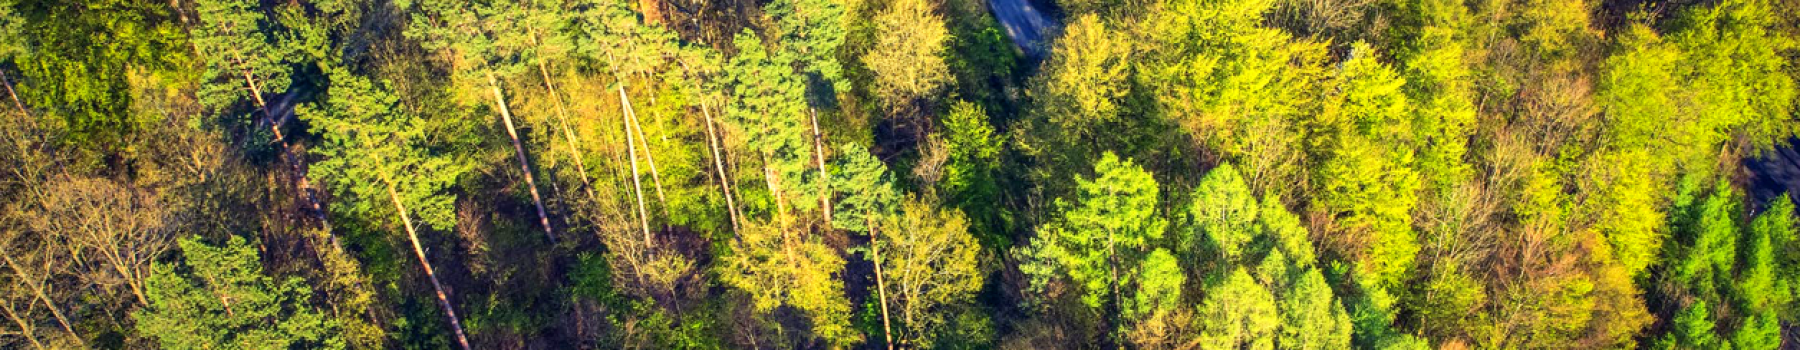 Environment Promo Image